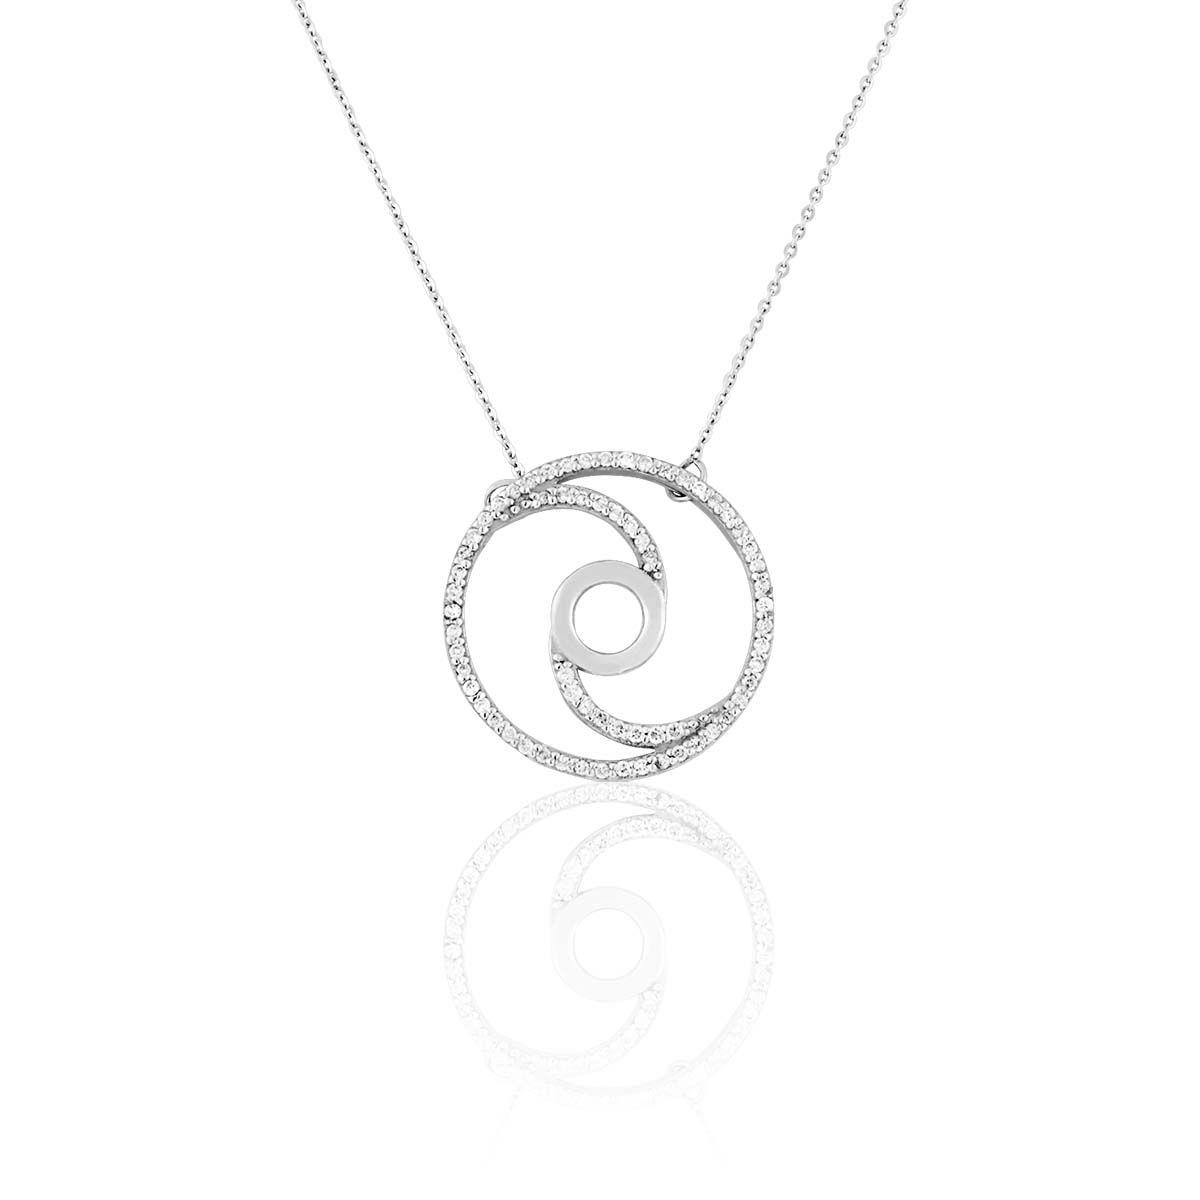 Collier Or 750/1000 Diamant